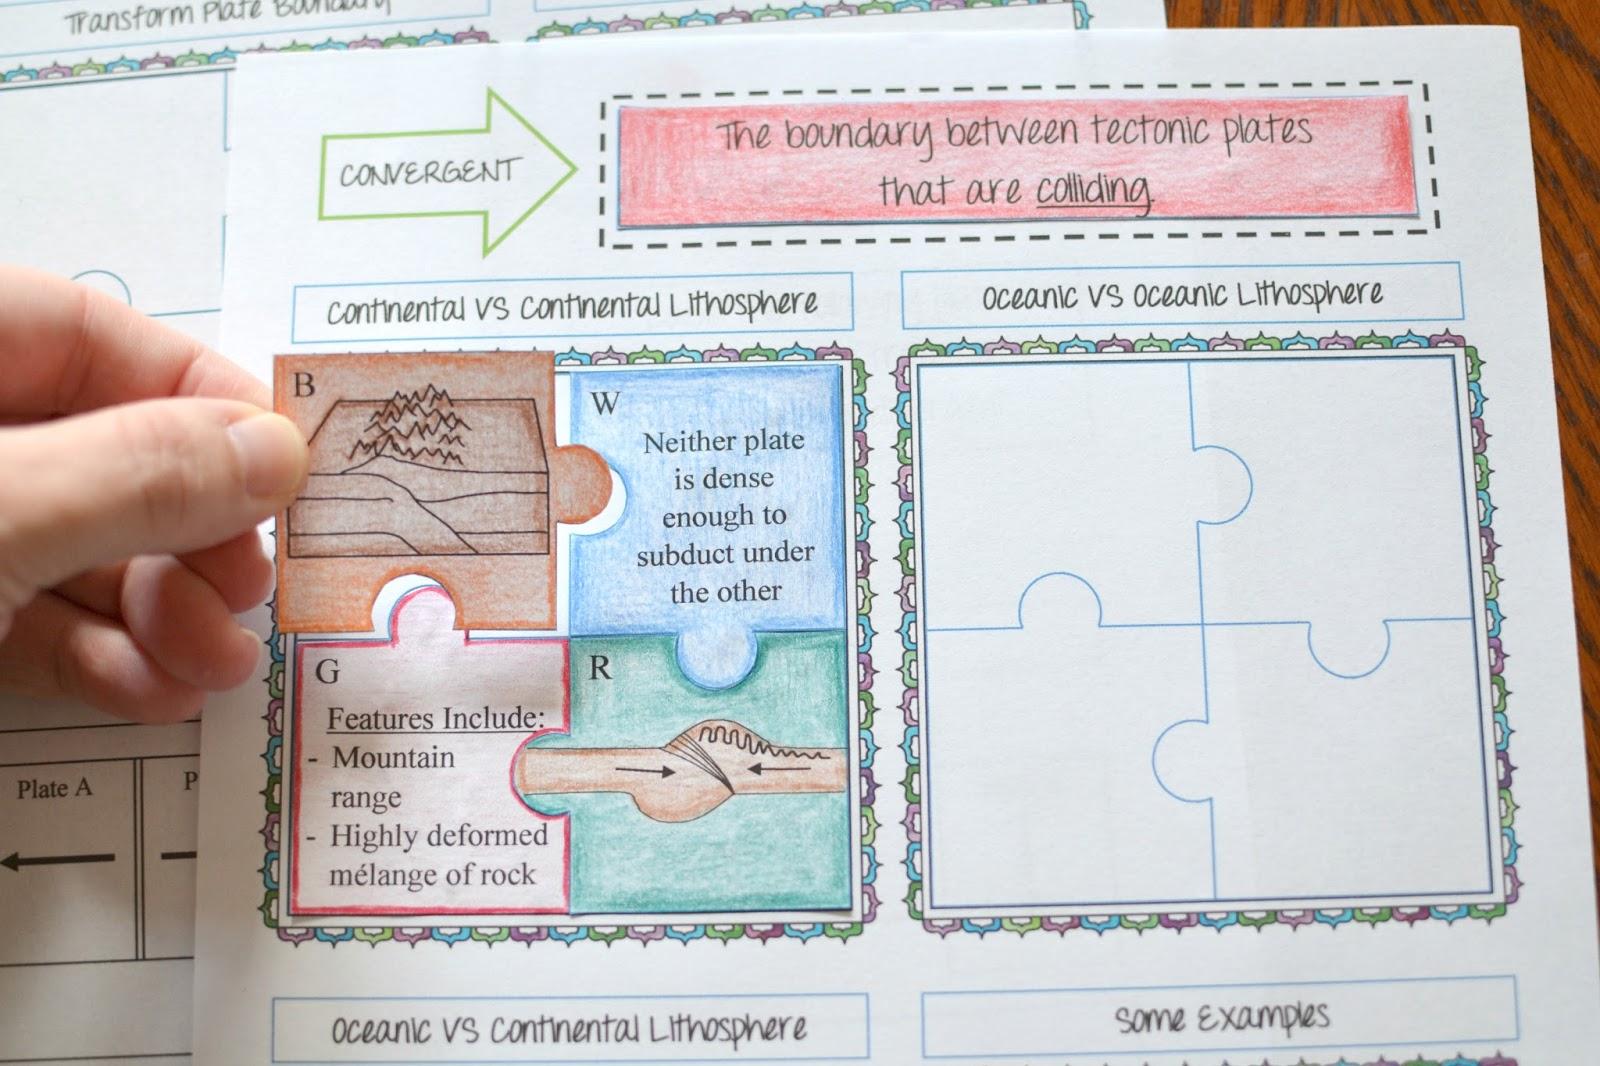 worksheet Types Of Plate Boundaries Worksheet usable types of plate boundaries worksheet goodsnyc com tectonics